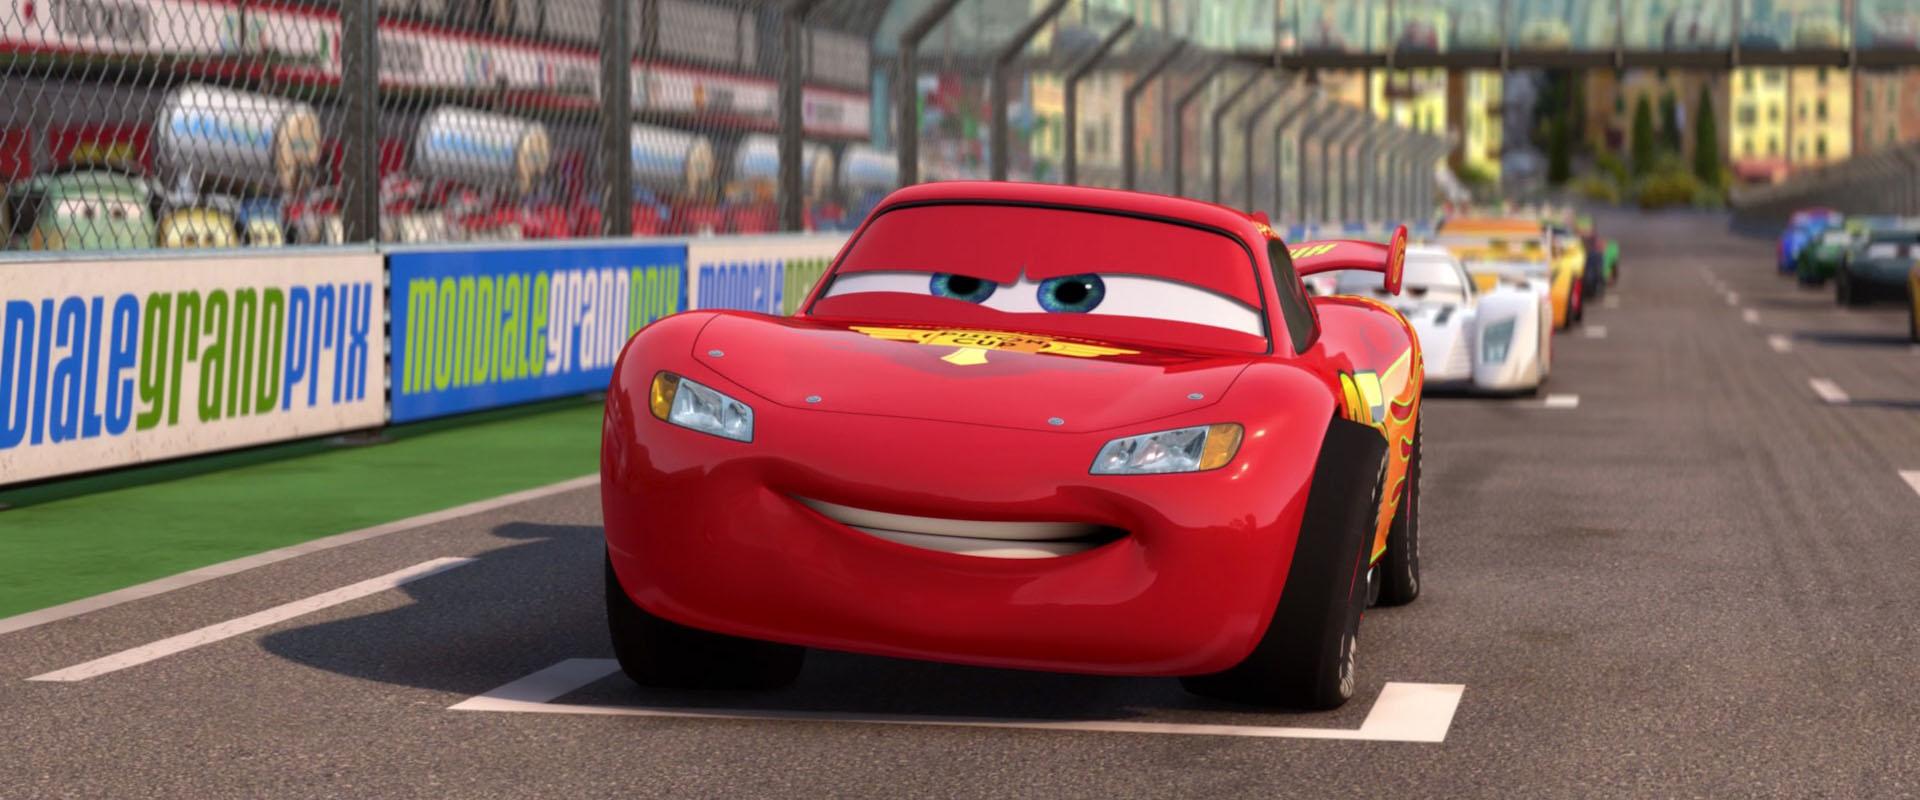 "Flash Mcqueen, Personnage Dans ""cars"". | Pixar-Planet.fr avec Flash Mcqueen Martin"